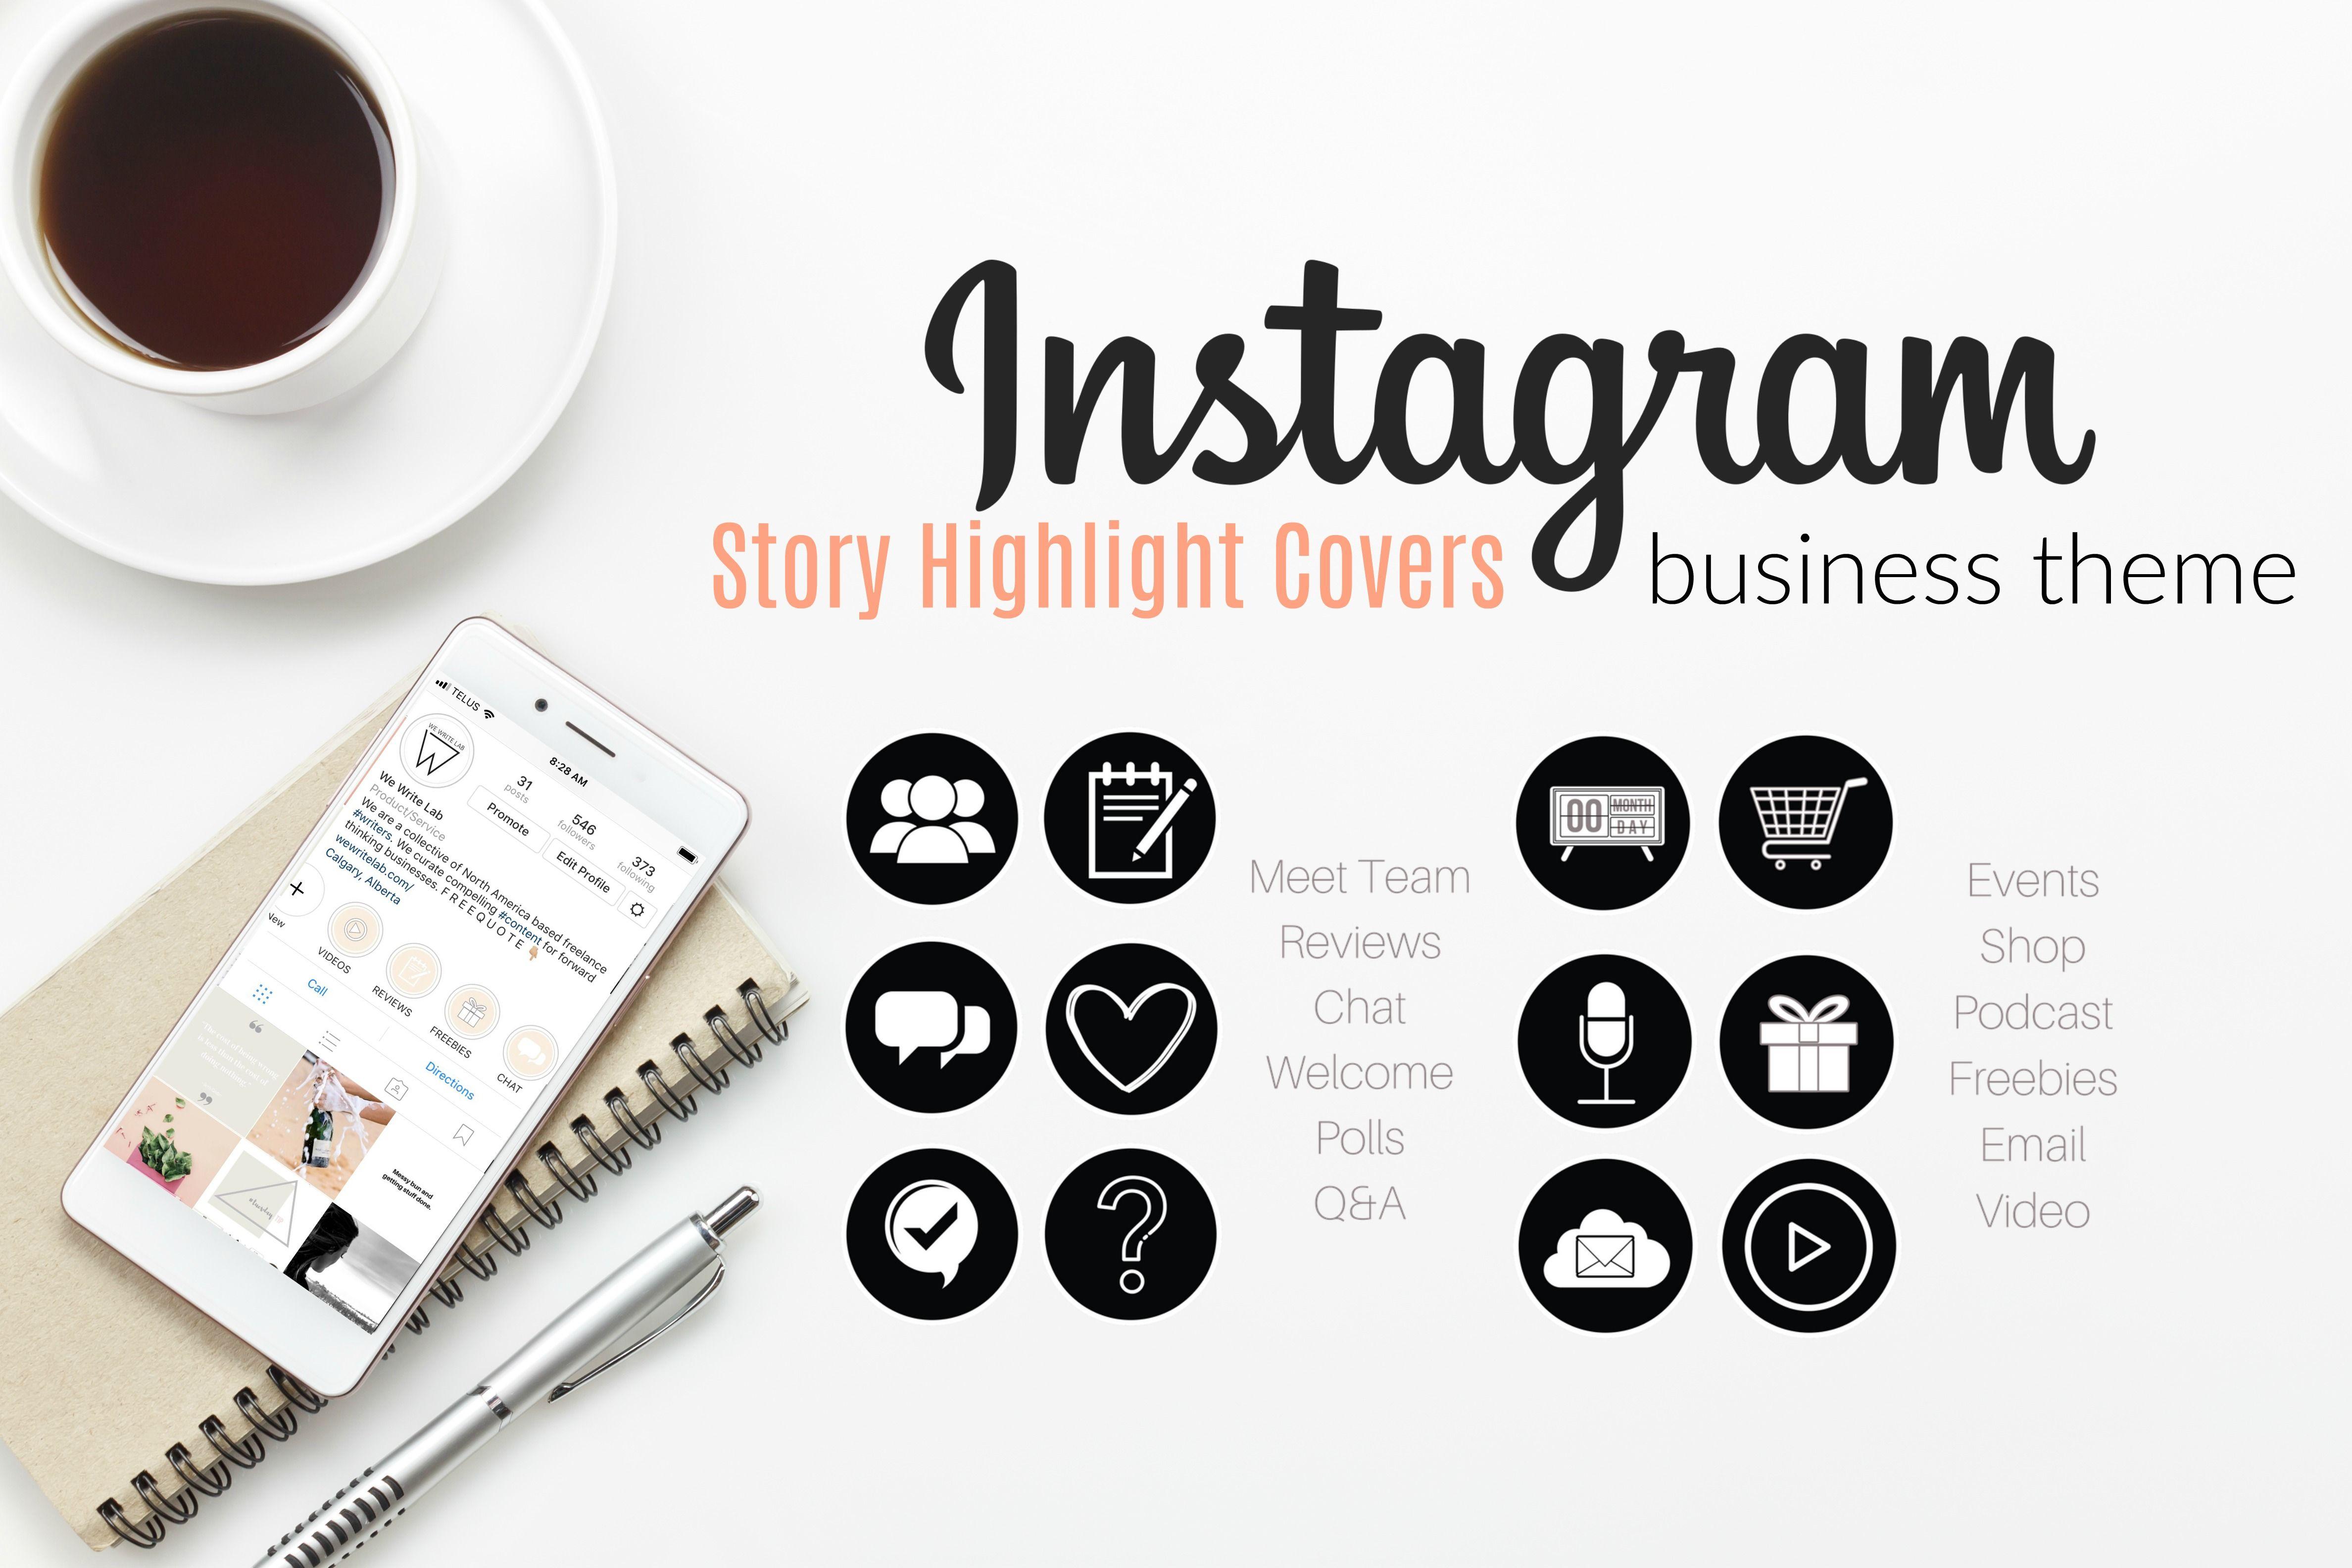 Instagram Story Highlight Icons Cover Pack For Business Black White For Instagram Stories Instagram Story Story Highlights Instagram Highlight Icons